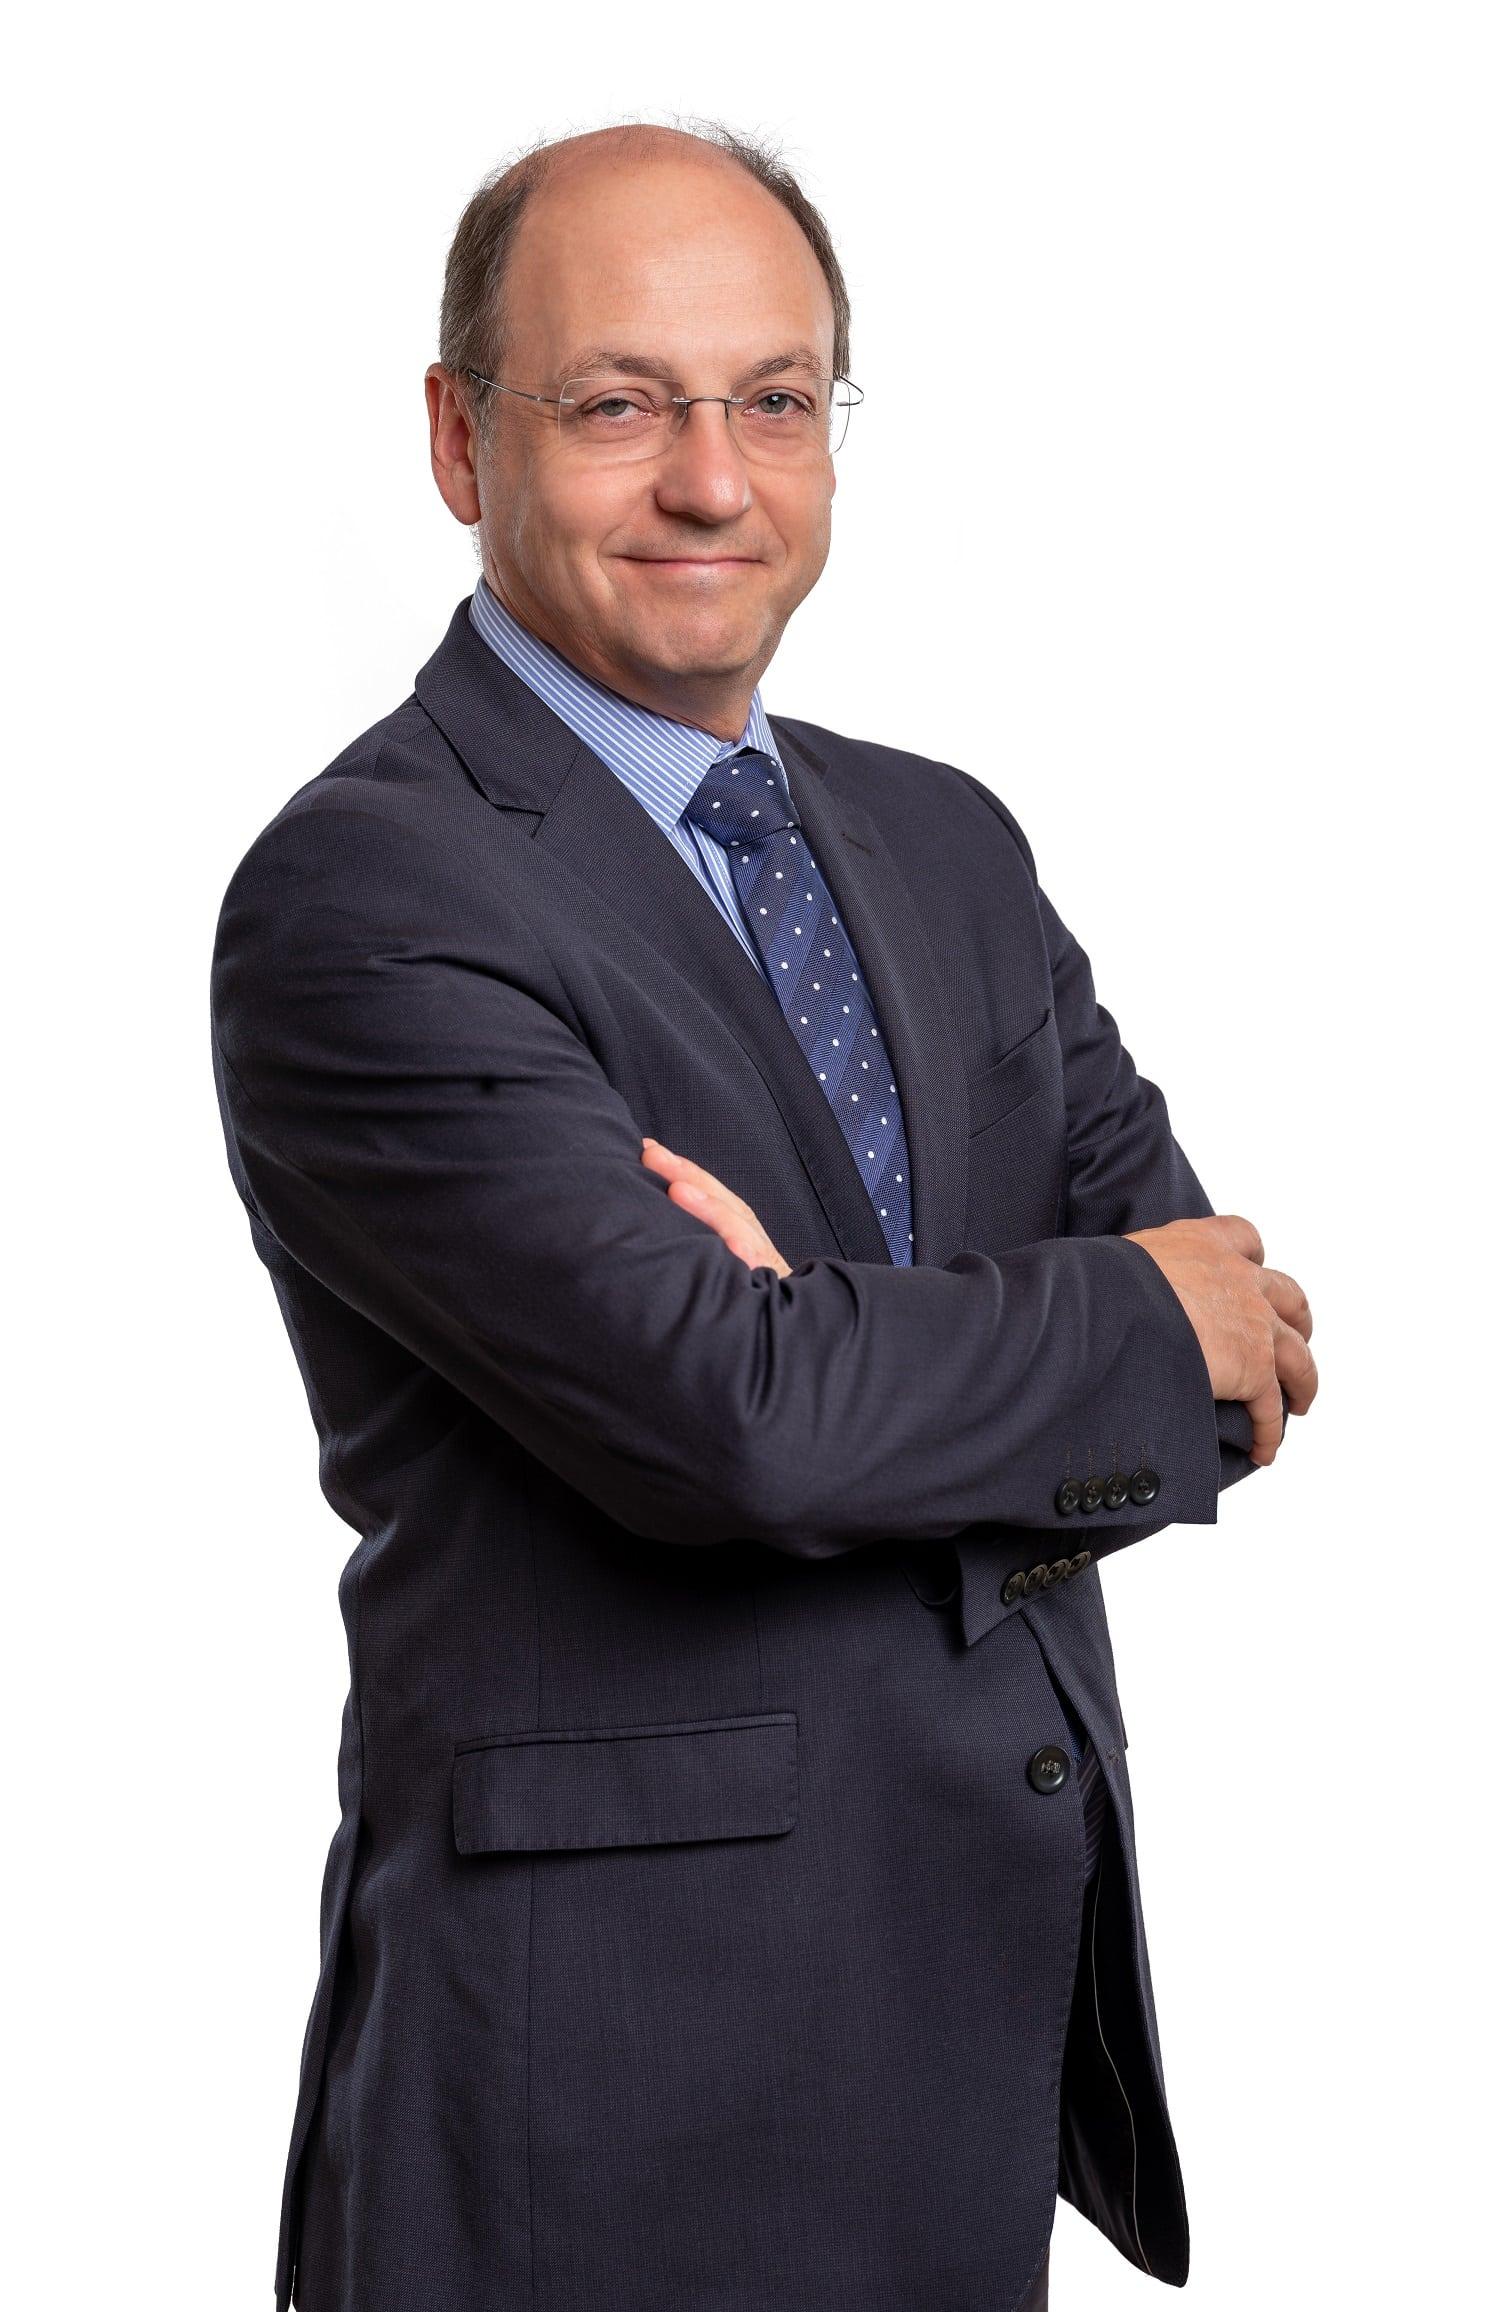 Dr. Jonathan Wasserberg